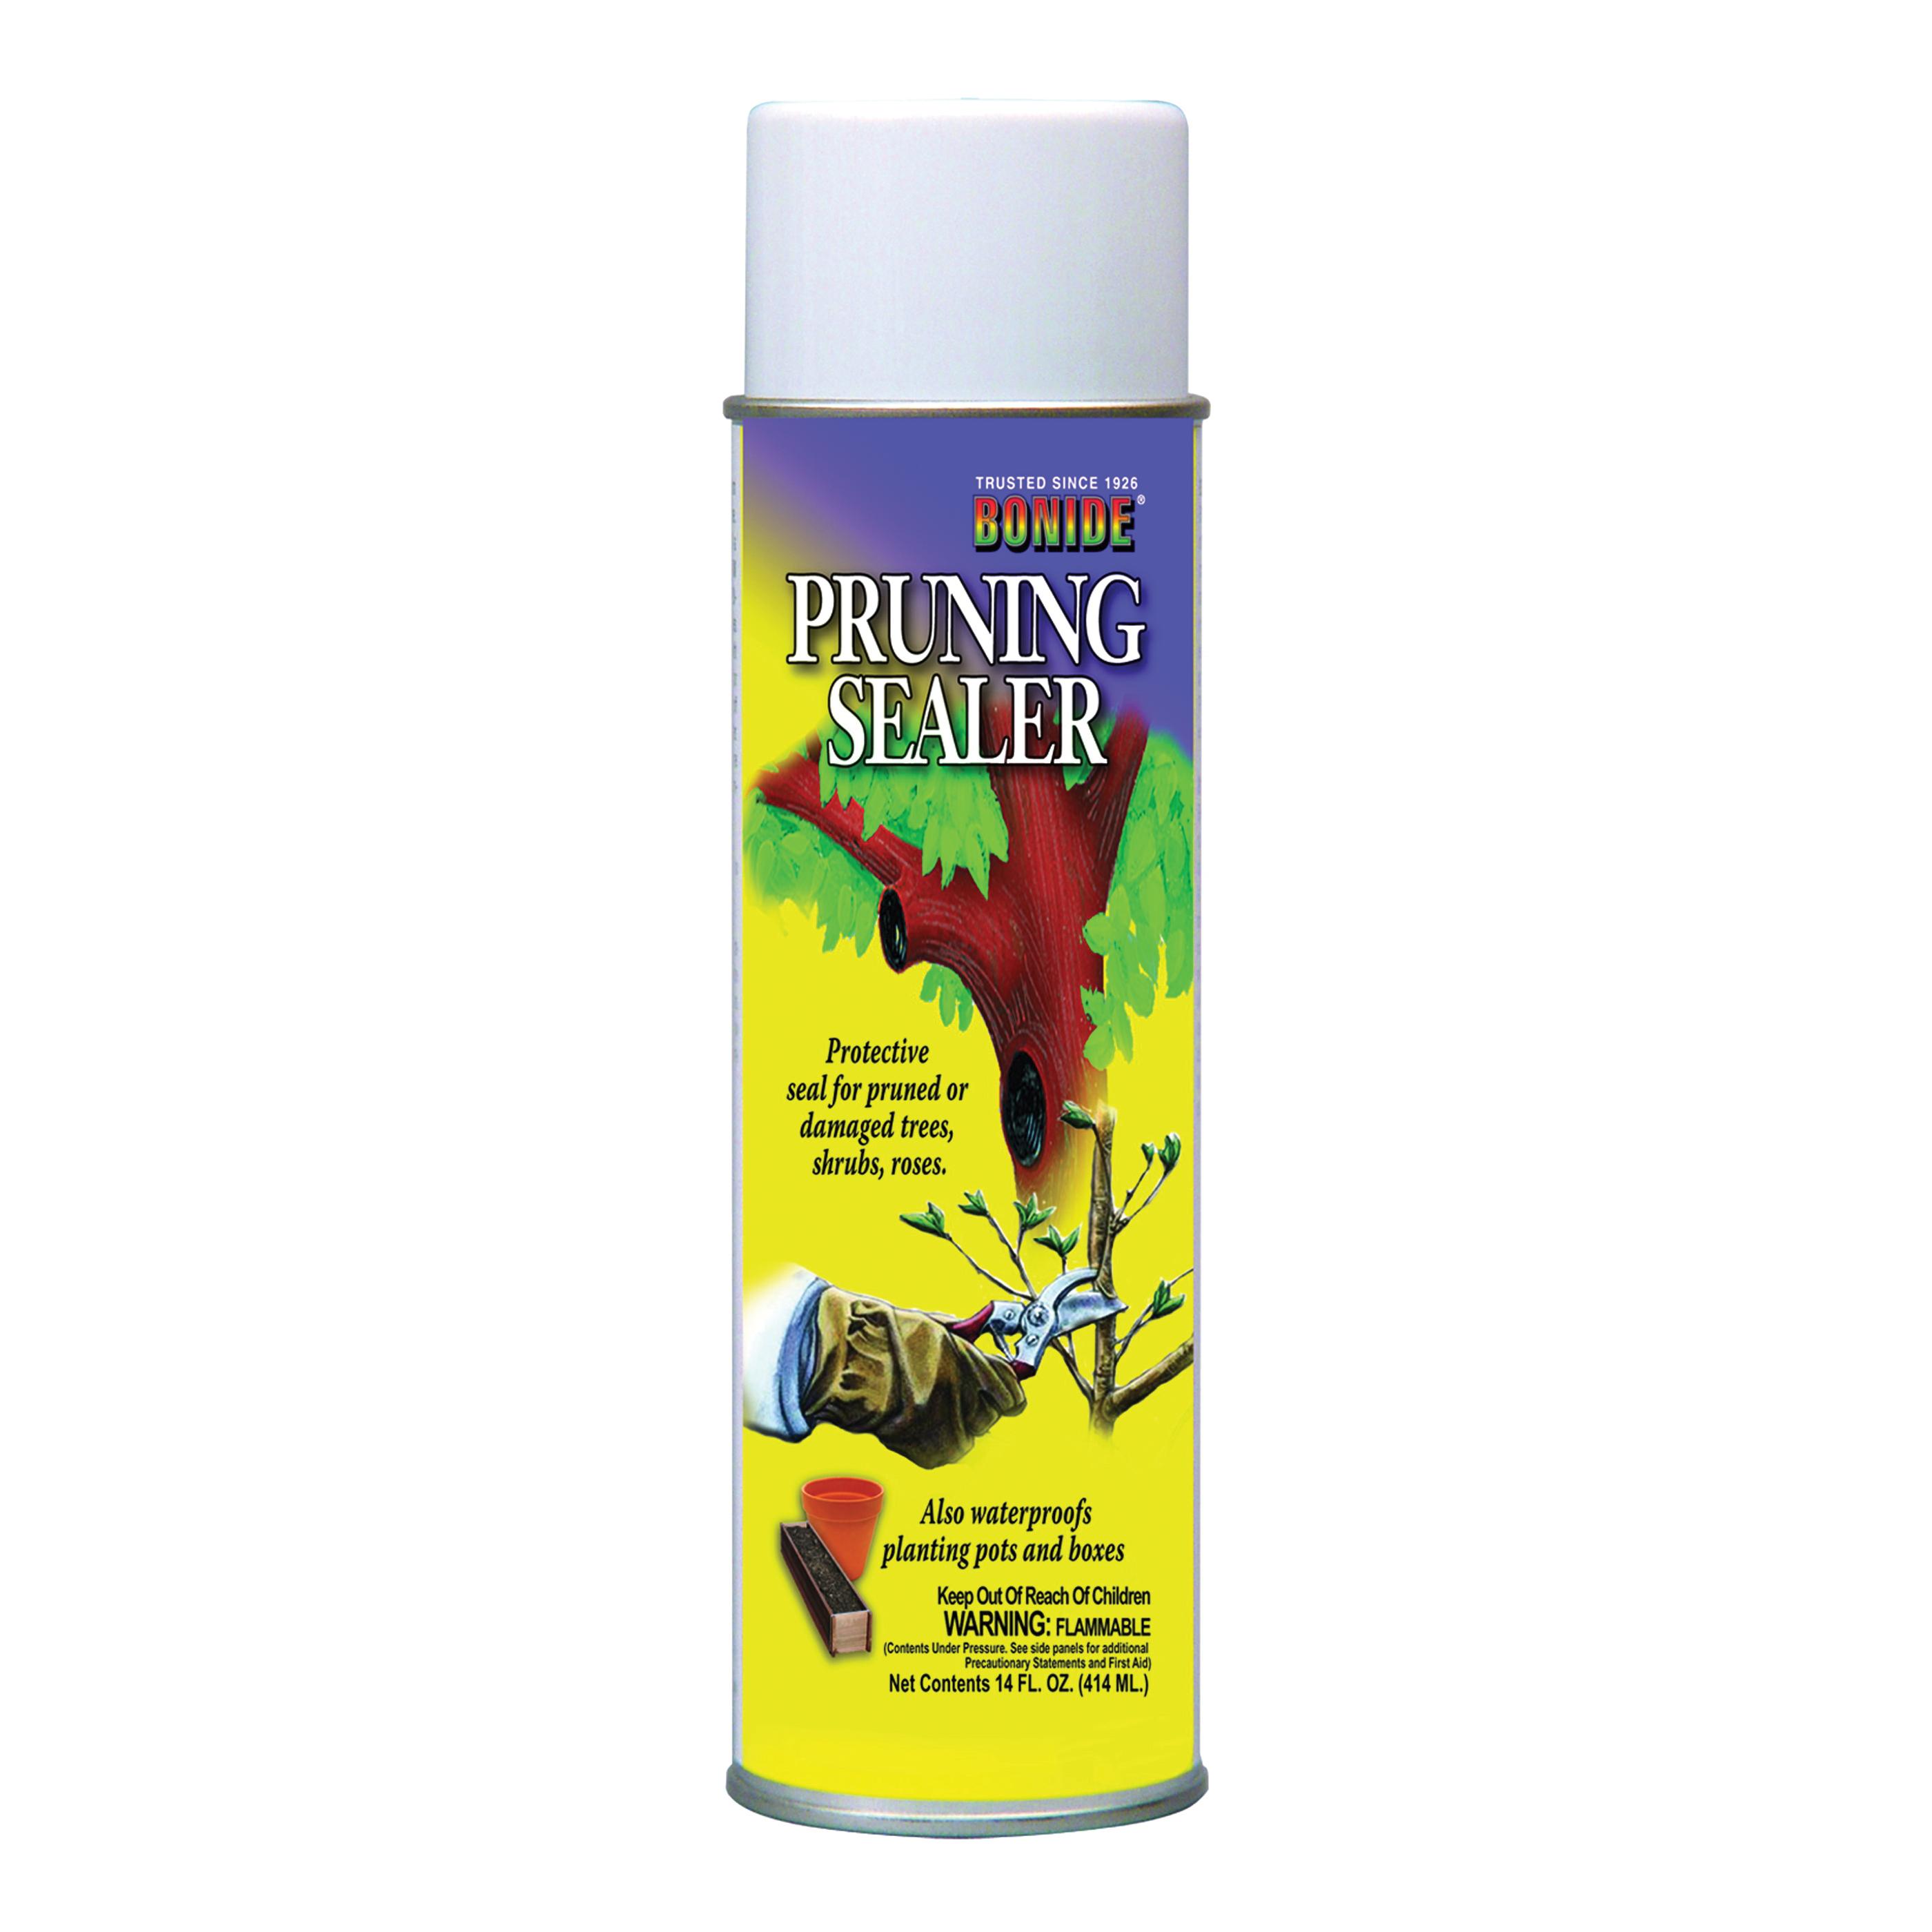 Picture of Bonide 221 Pruning Sealer, Liquid, Petroleum Solvent, Black, 14 oz Package, Aerosol Can